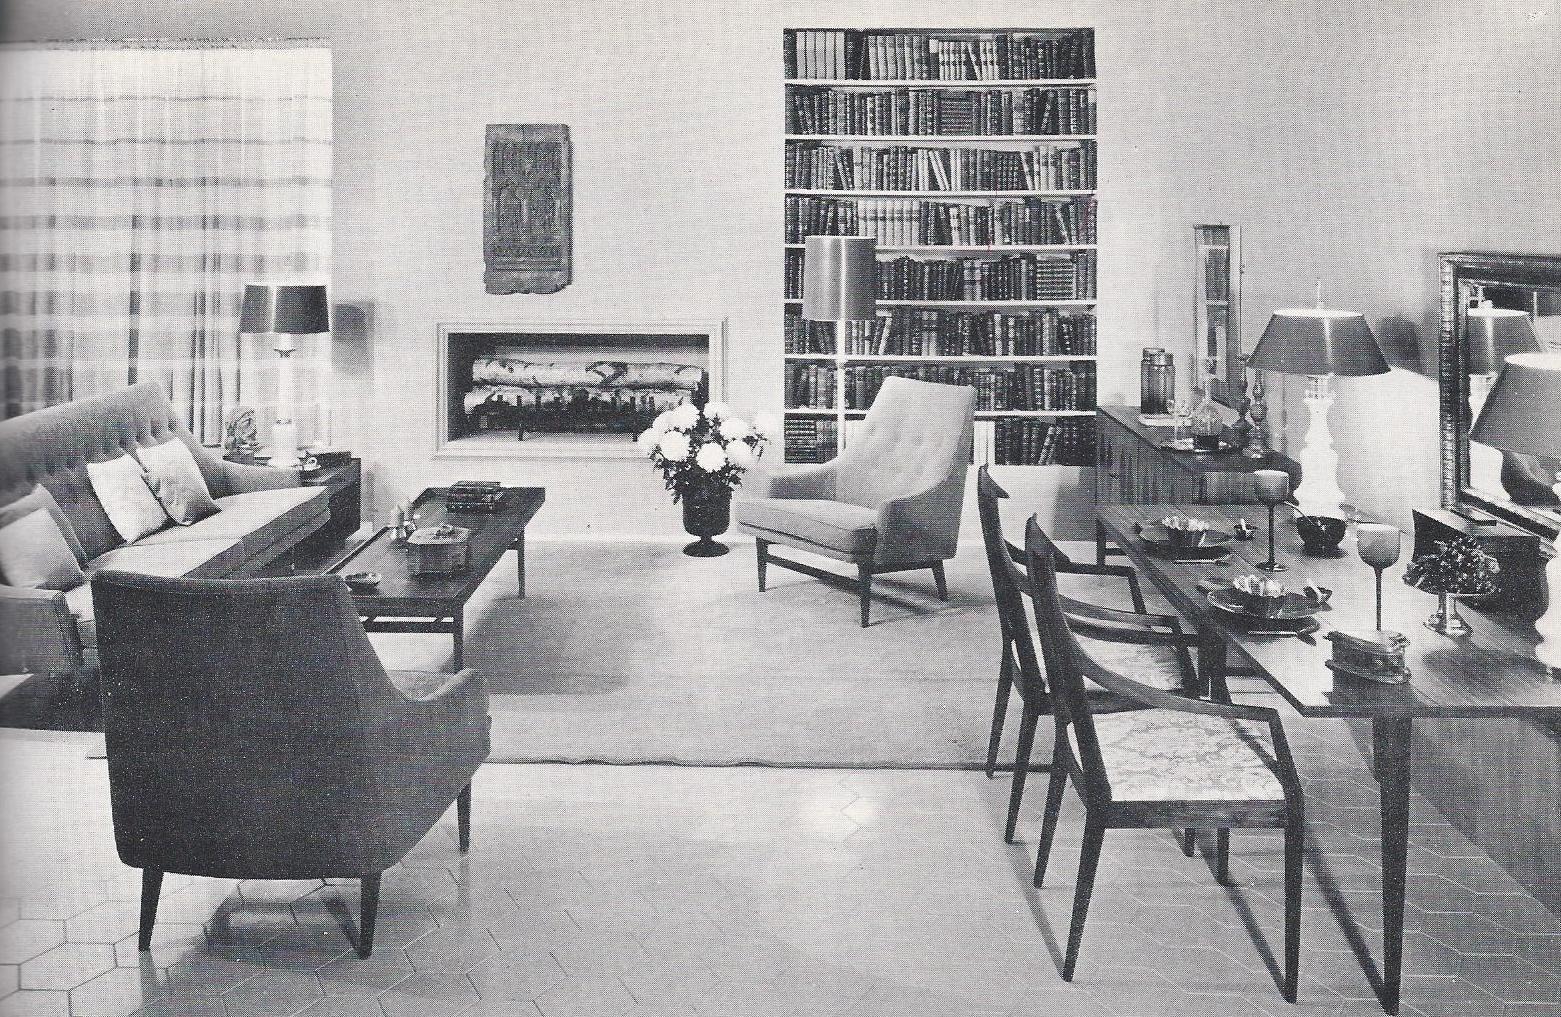 1960\'s Home Decor | Vintage Home Decorating 1960s: How to Arrange ...